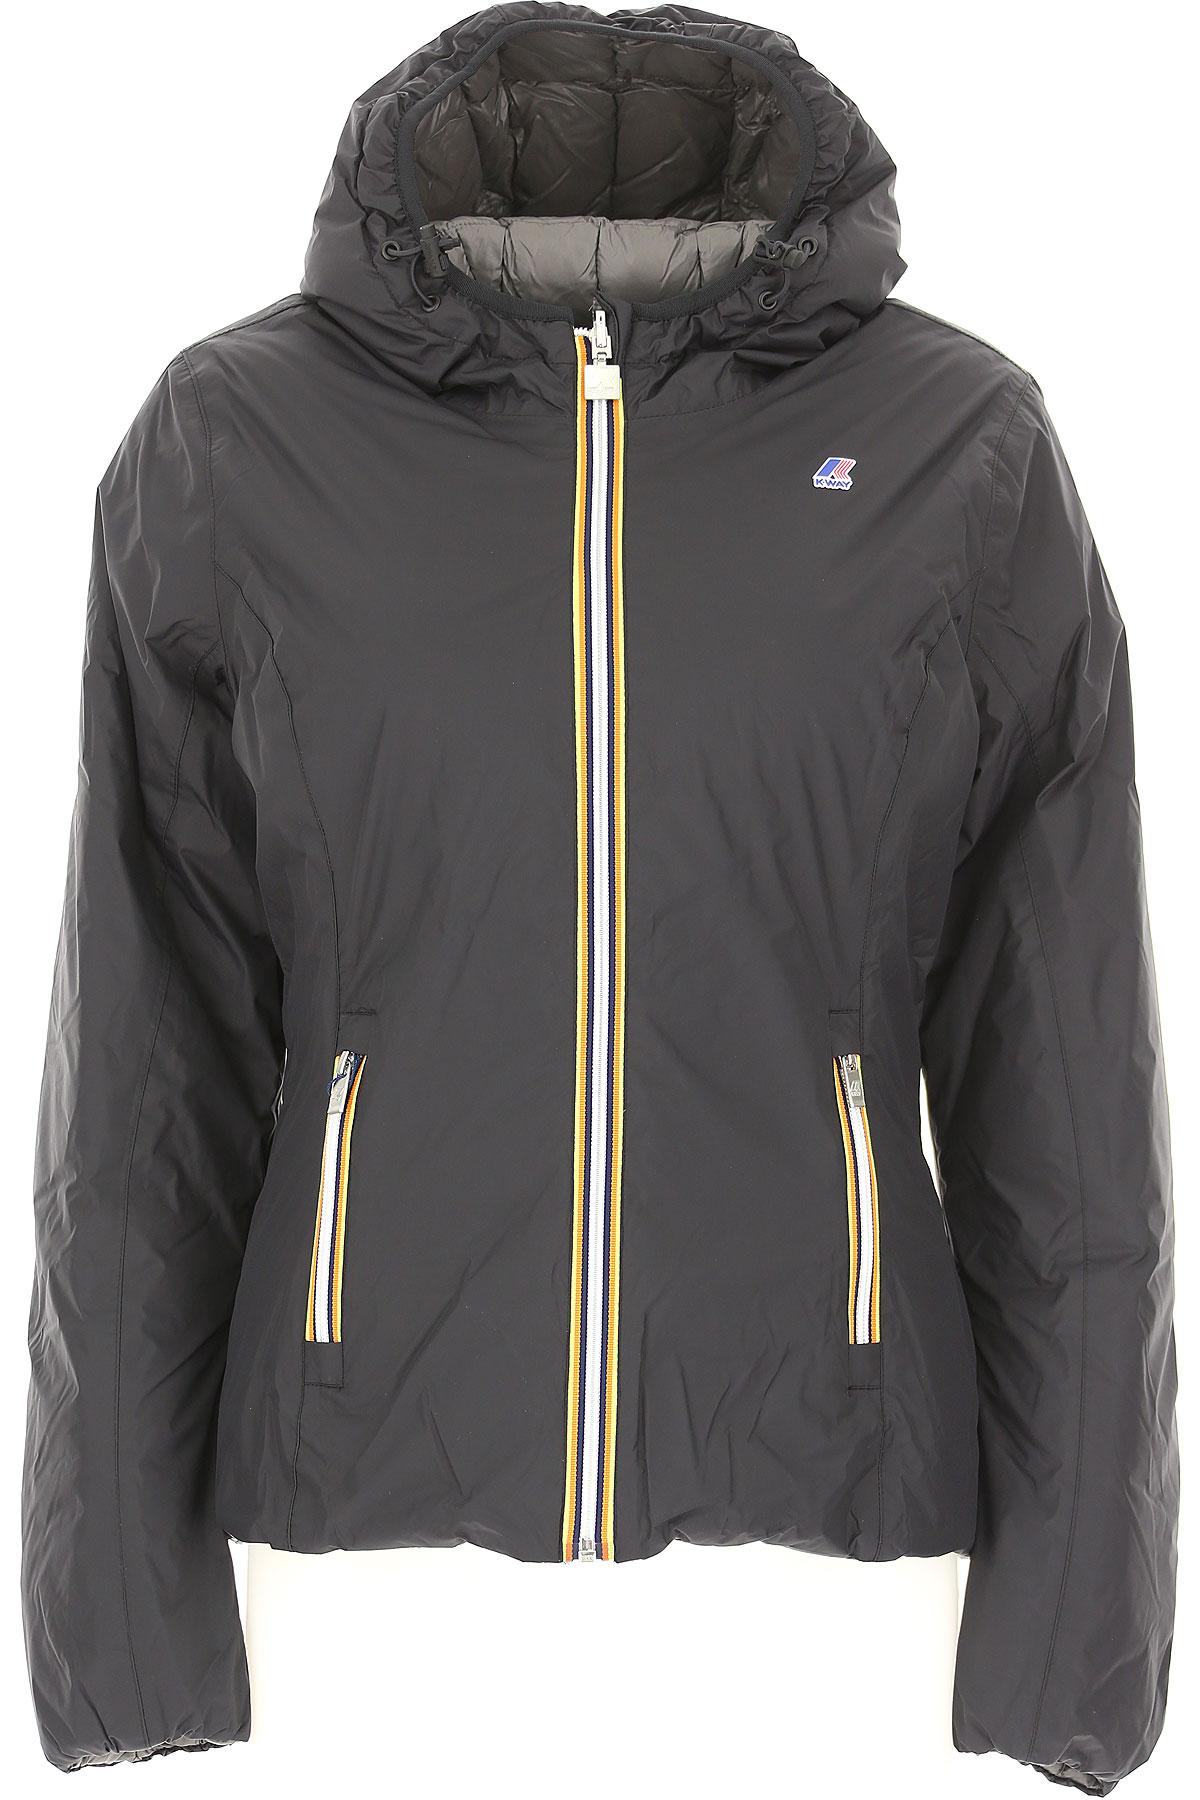 K-Way Down Jacket for Women, Puffer Ski Jacket On Sale, Reversible, Black, Down, 2019, 40 44